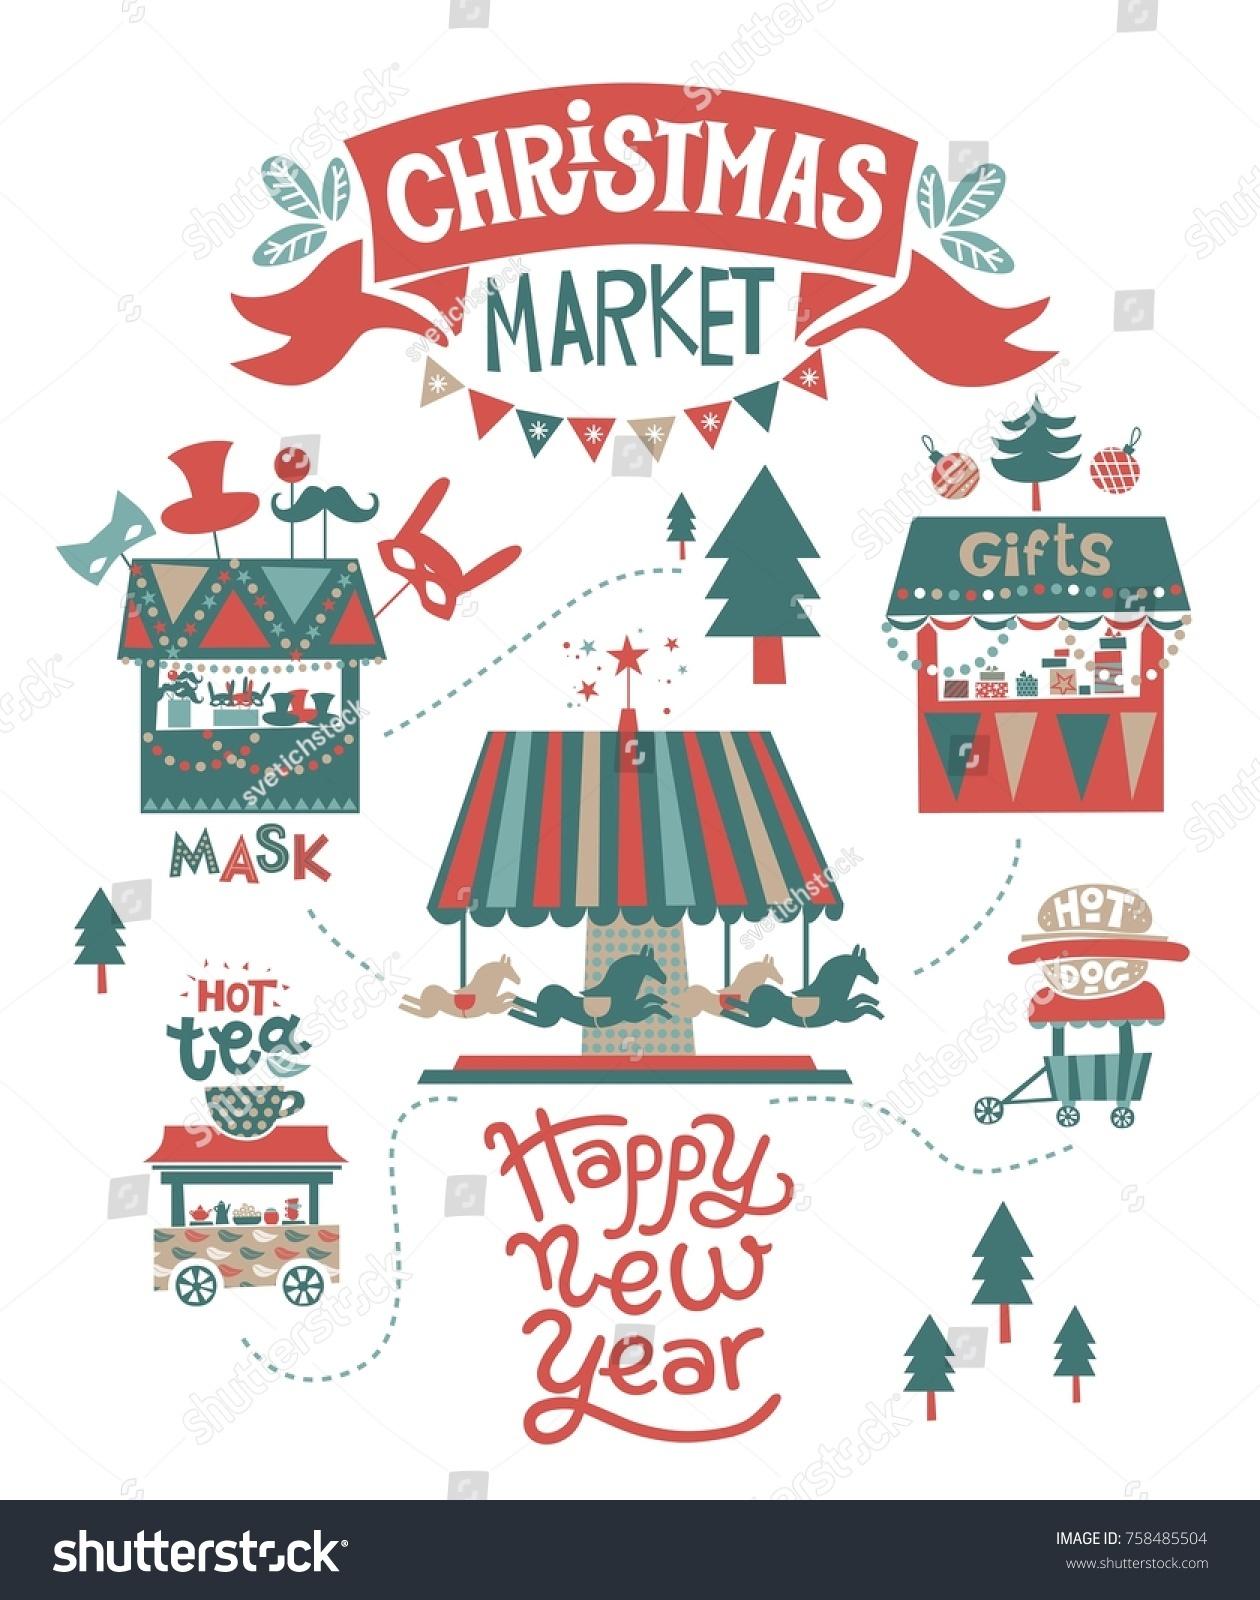 Happy Christmas Happy New Year Illustration Stock Vector (Royalty ...